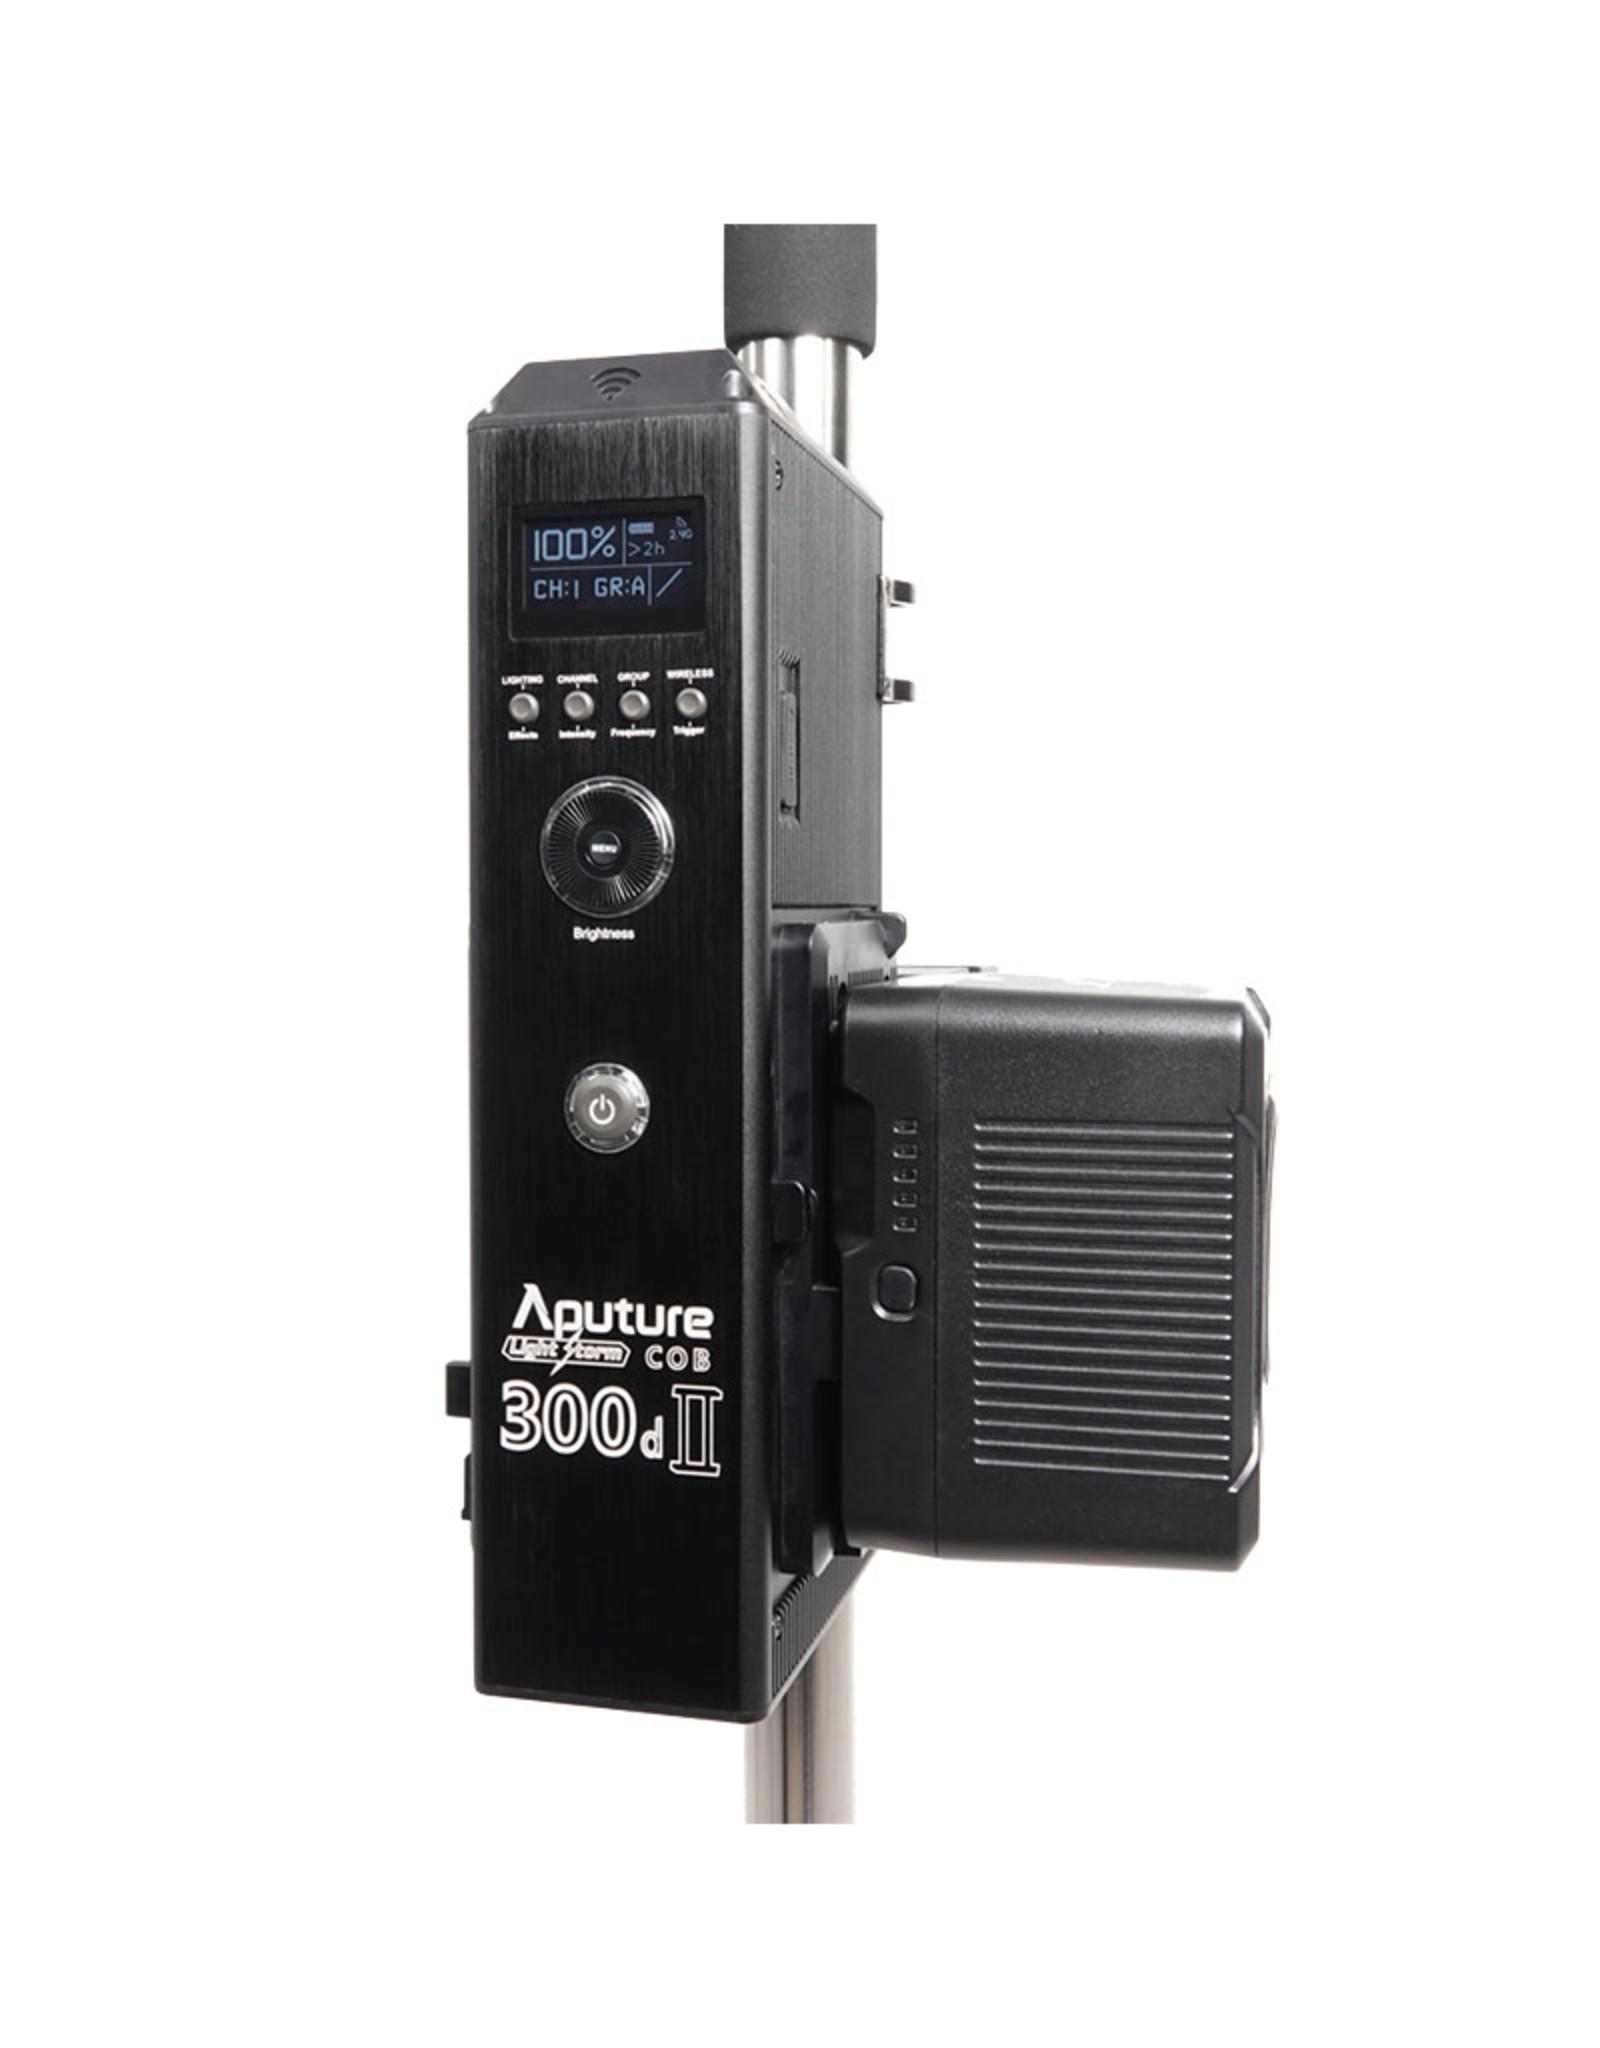 Aputure Aputure LS300d II Daylight LED Light (V-mount)